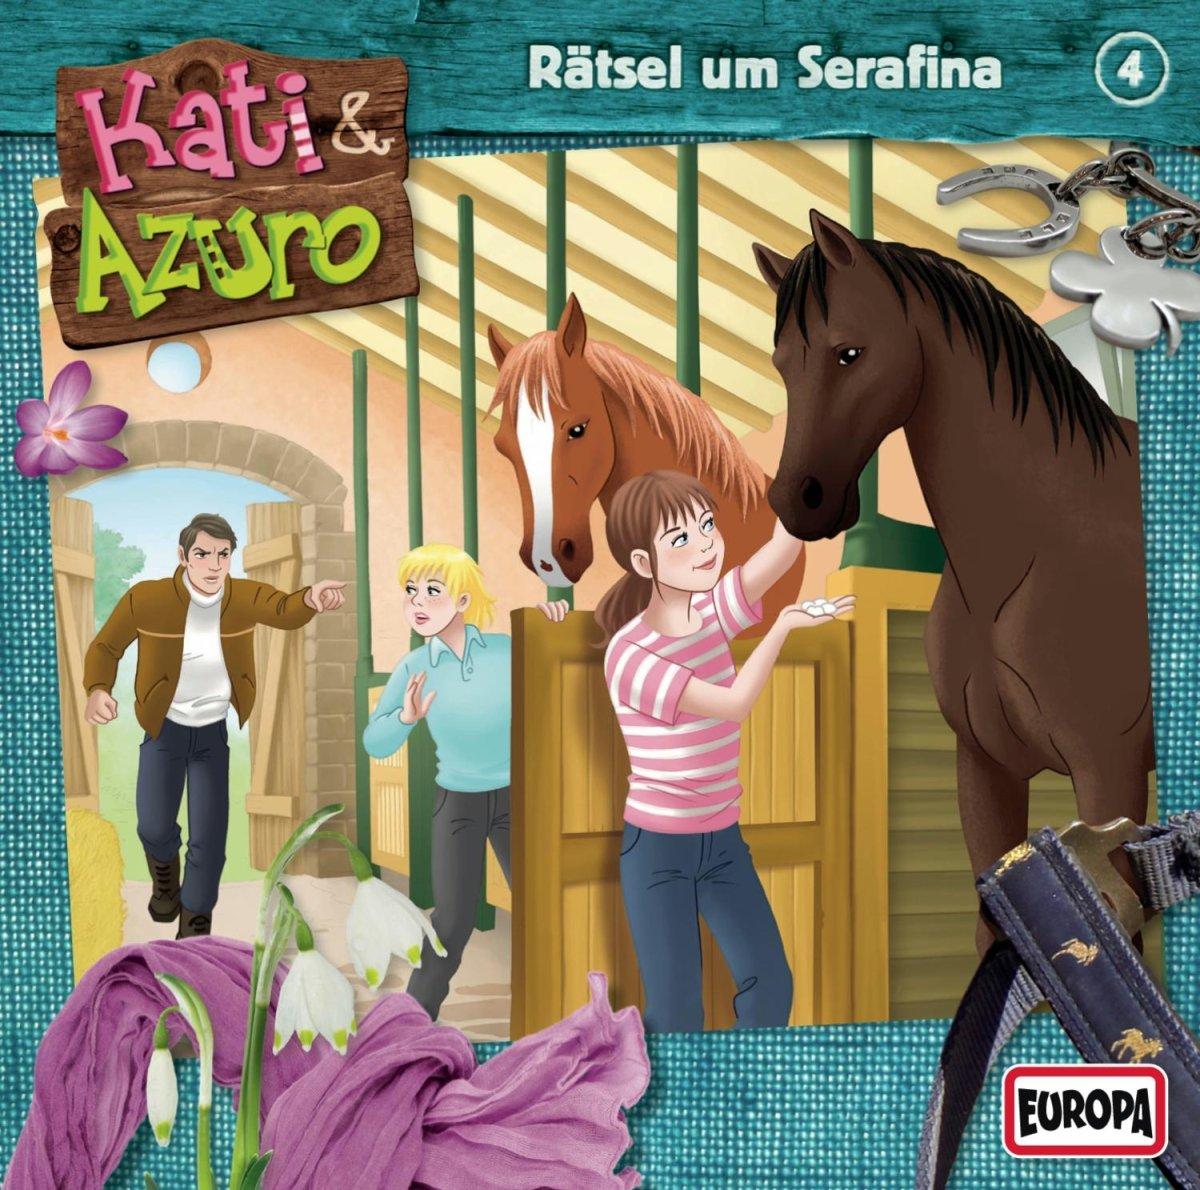 Kati und Azuro (4) Rätsel um Serafina (Europa)